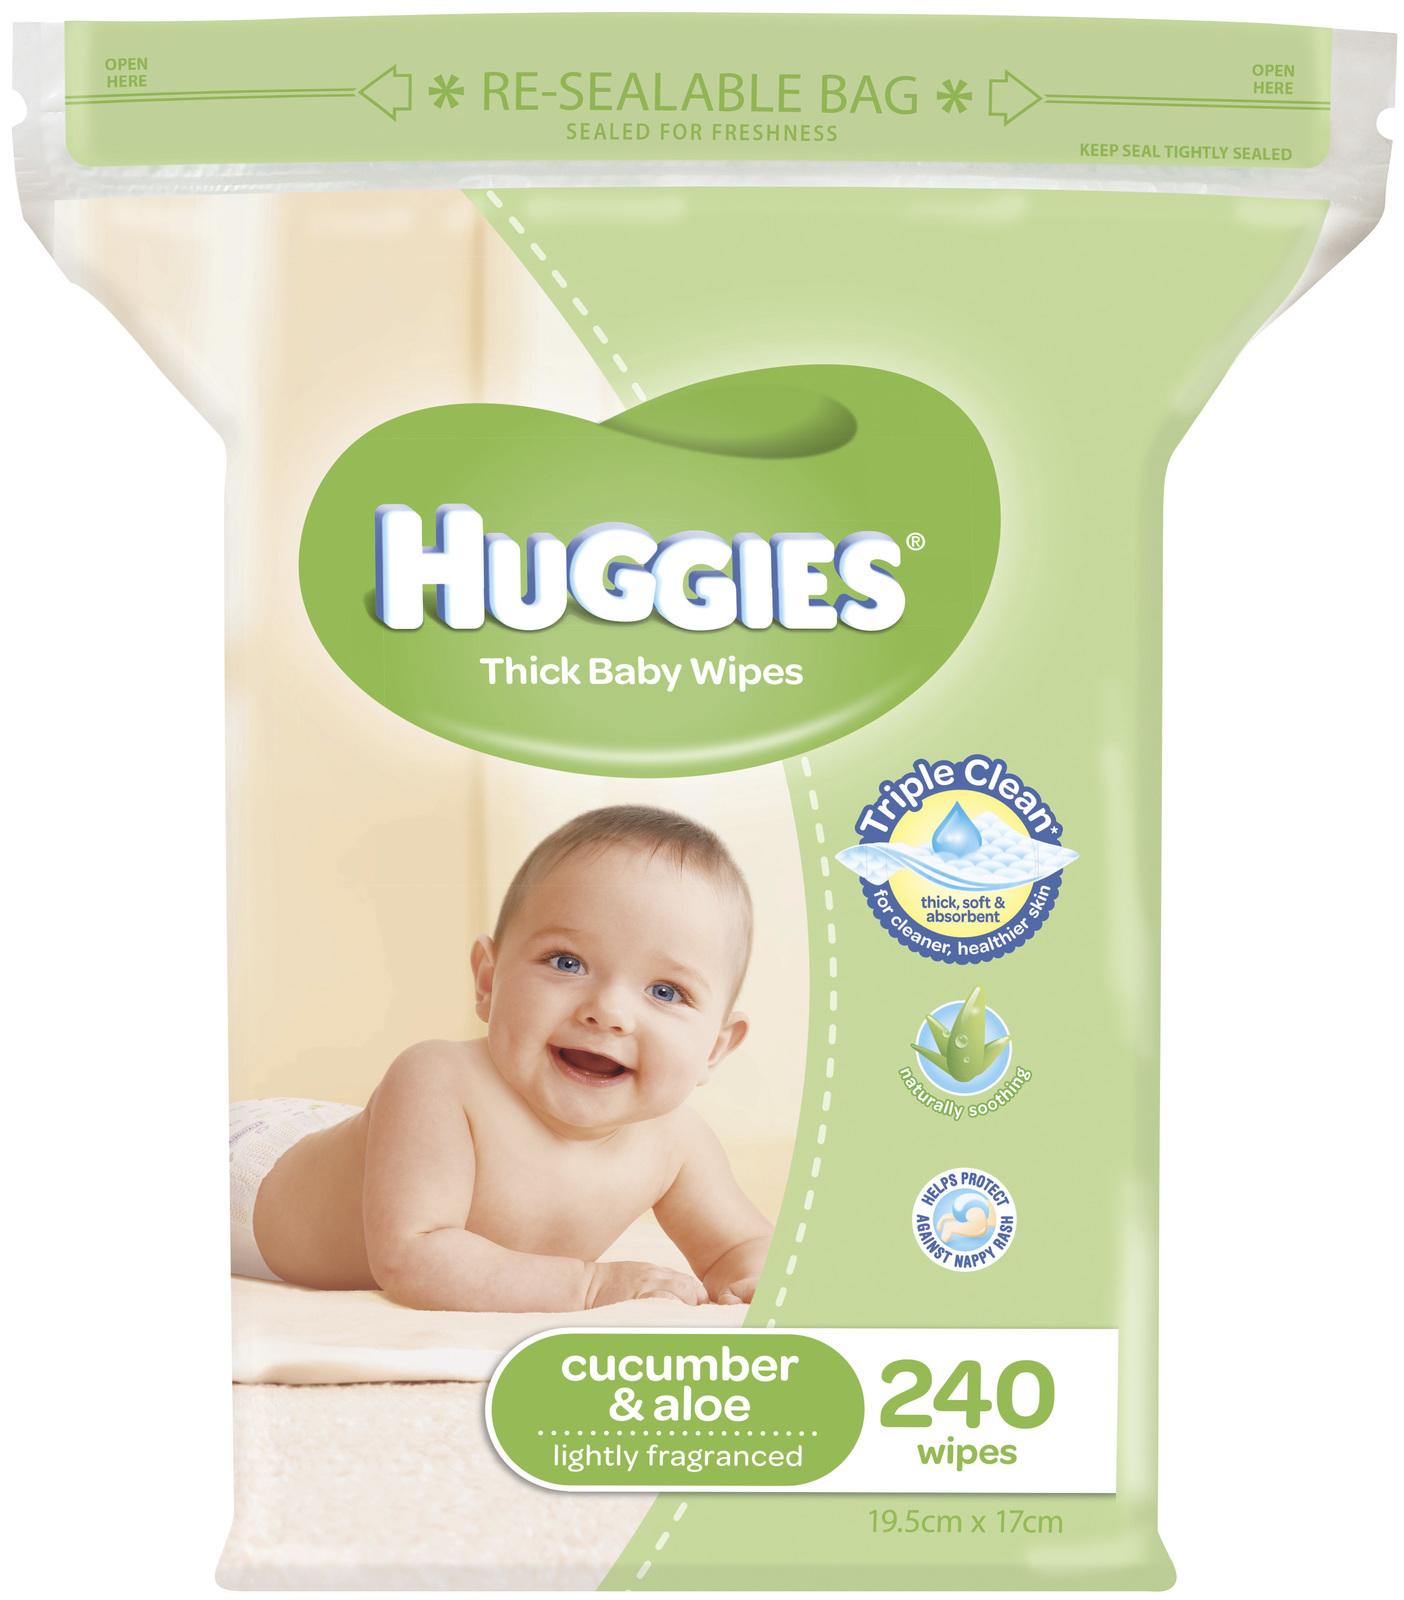 Huggies Cucumber & Aloe Wipes - Jumbo Pack (240) image